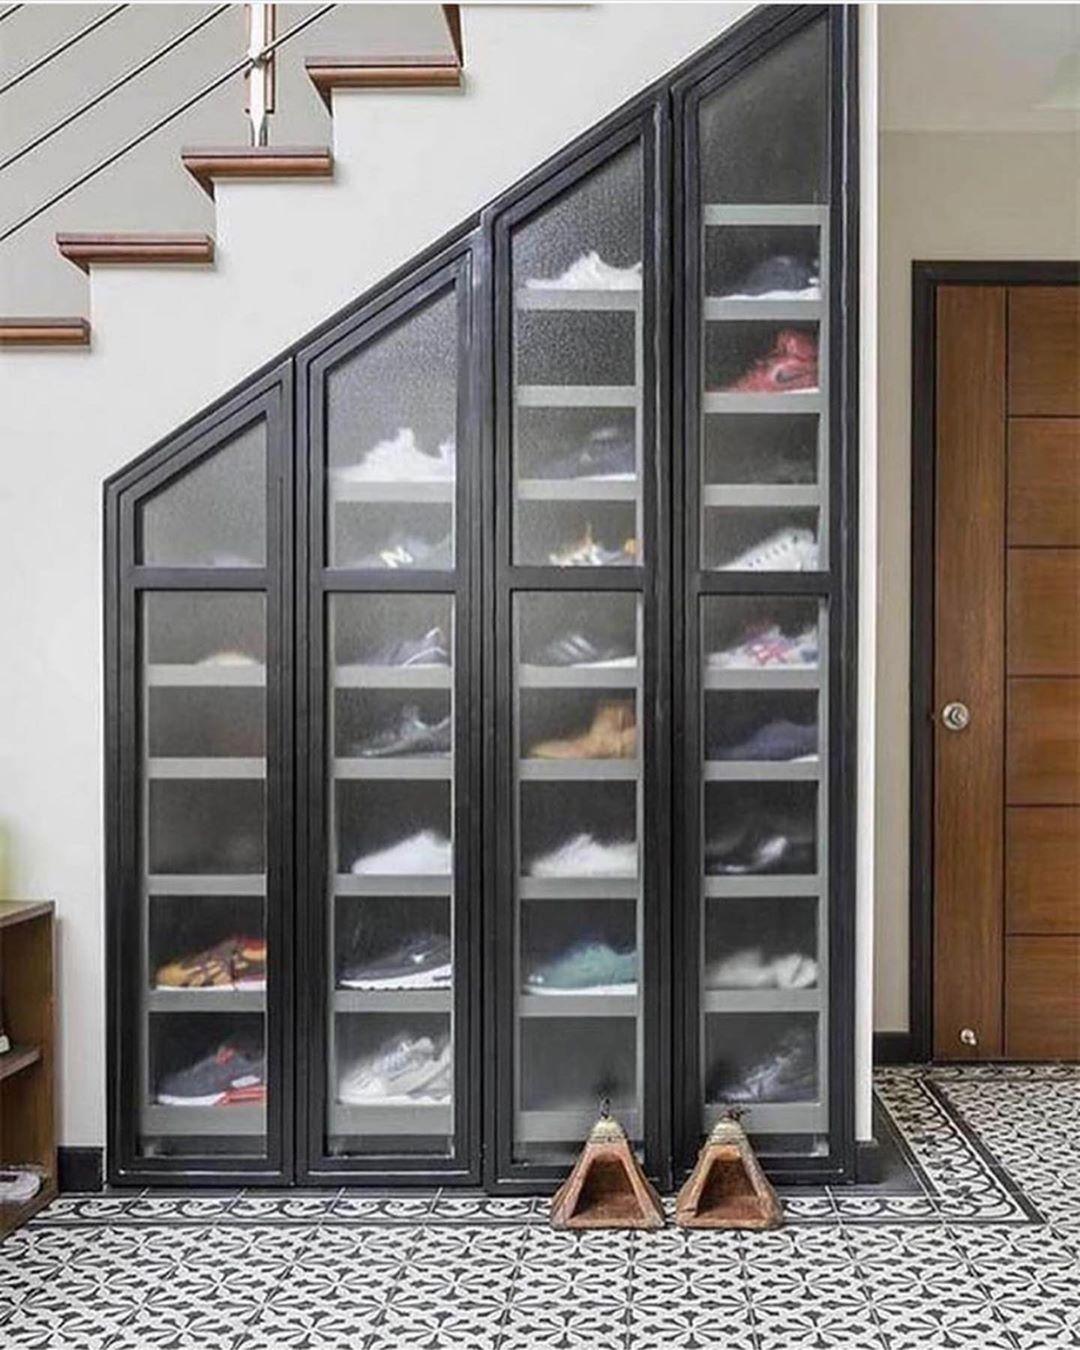 Reklam Icin Iletisim Dm On Instagram Dekorasyon Istanbul 1 10 Arasi Kac Puan Verir Storage Furniture Bedroom Space Saving Shoe Rack Home Interior Design